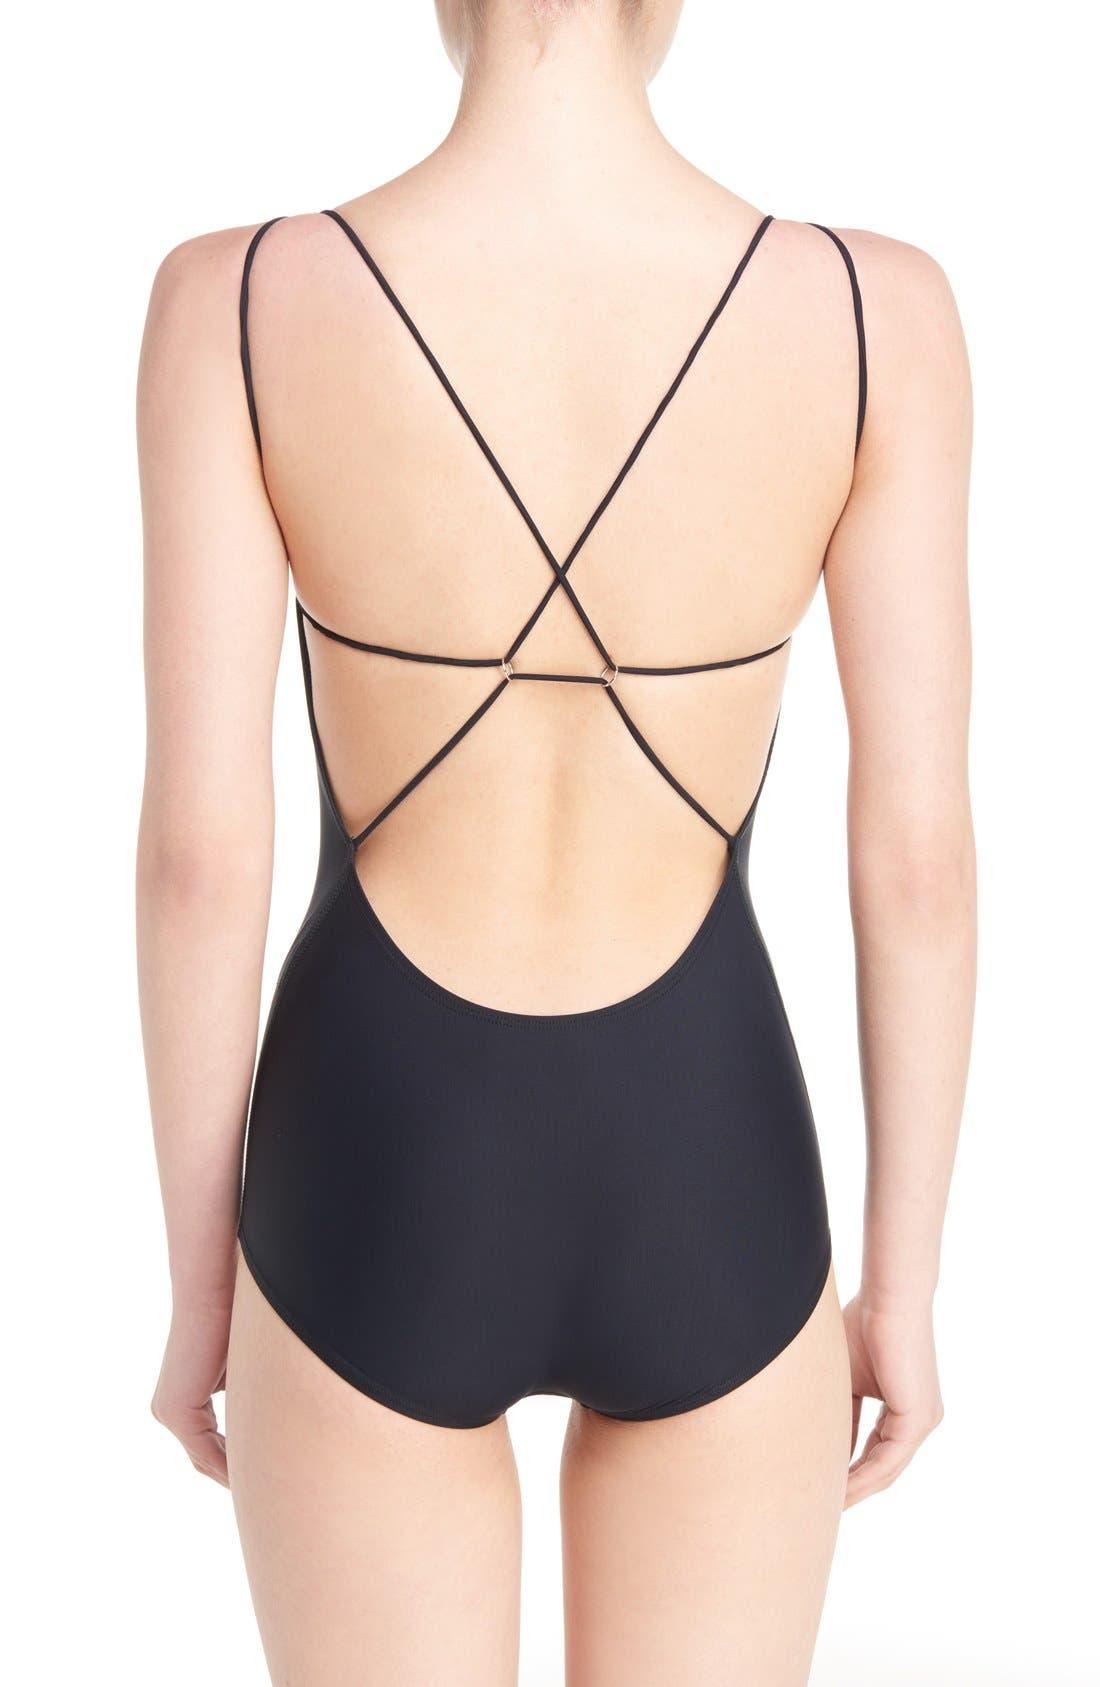 Halla One-Piece Swimsuit,                             Alternate thumbnail 2, color,                             BLACK